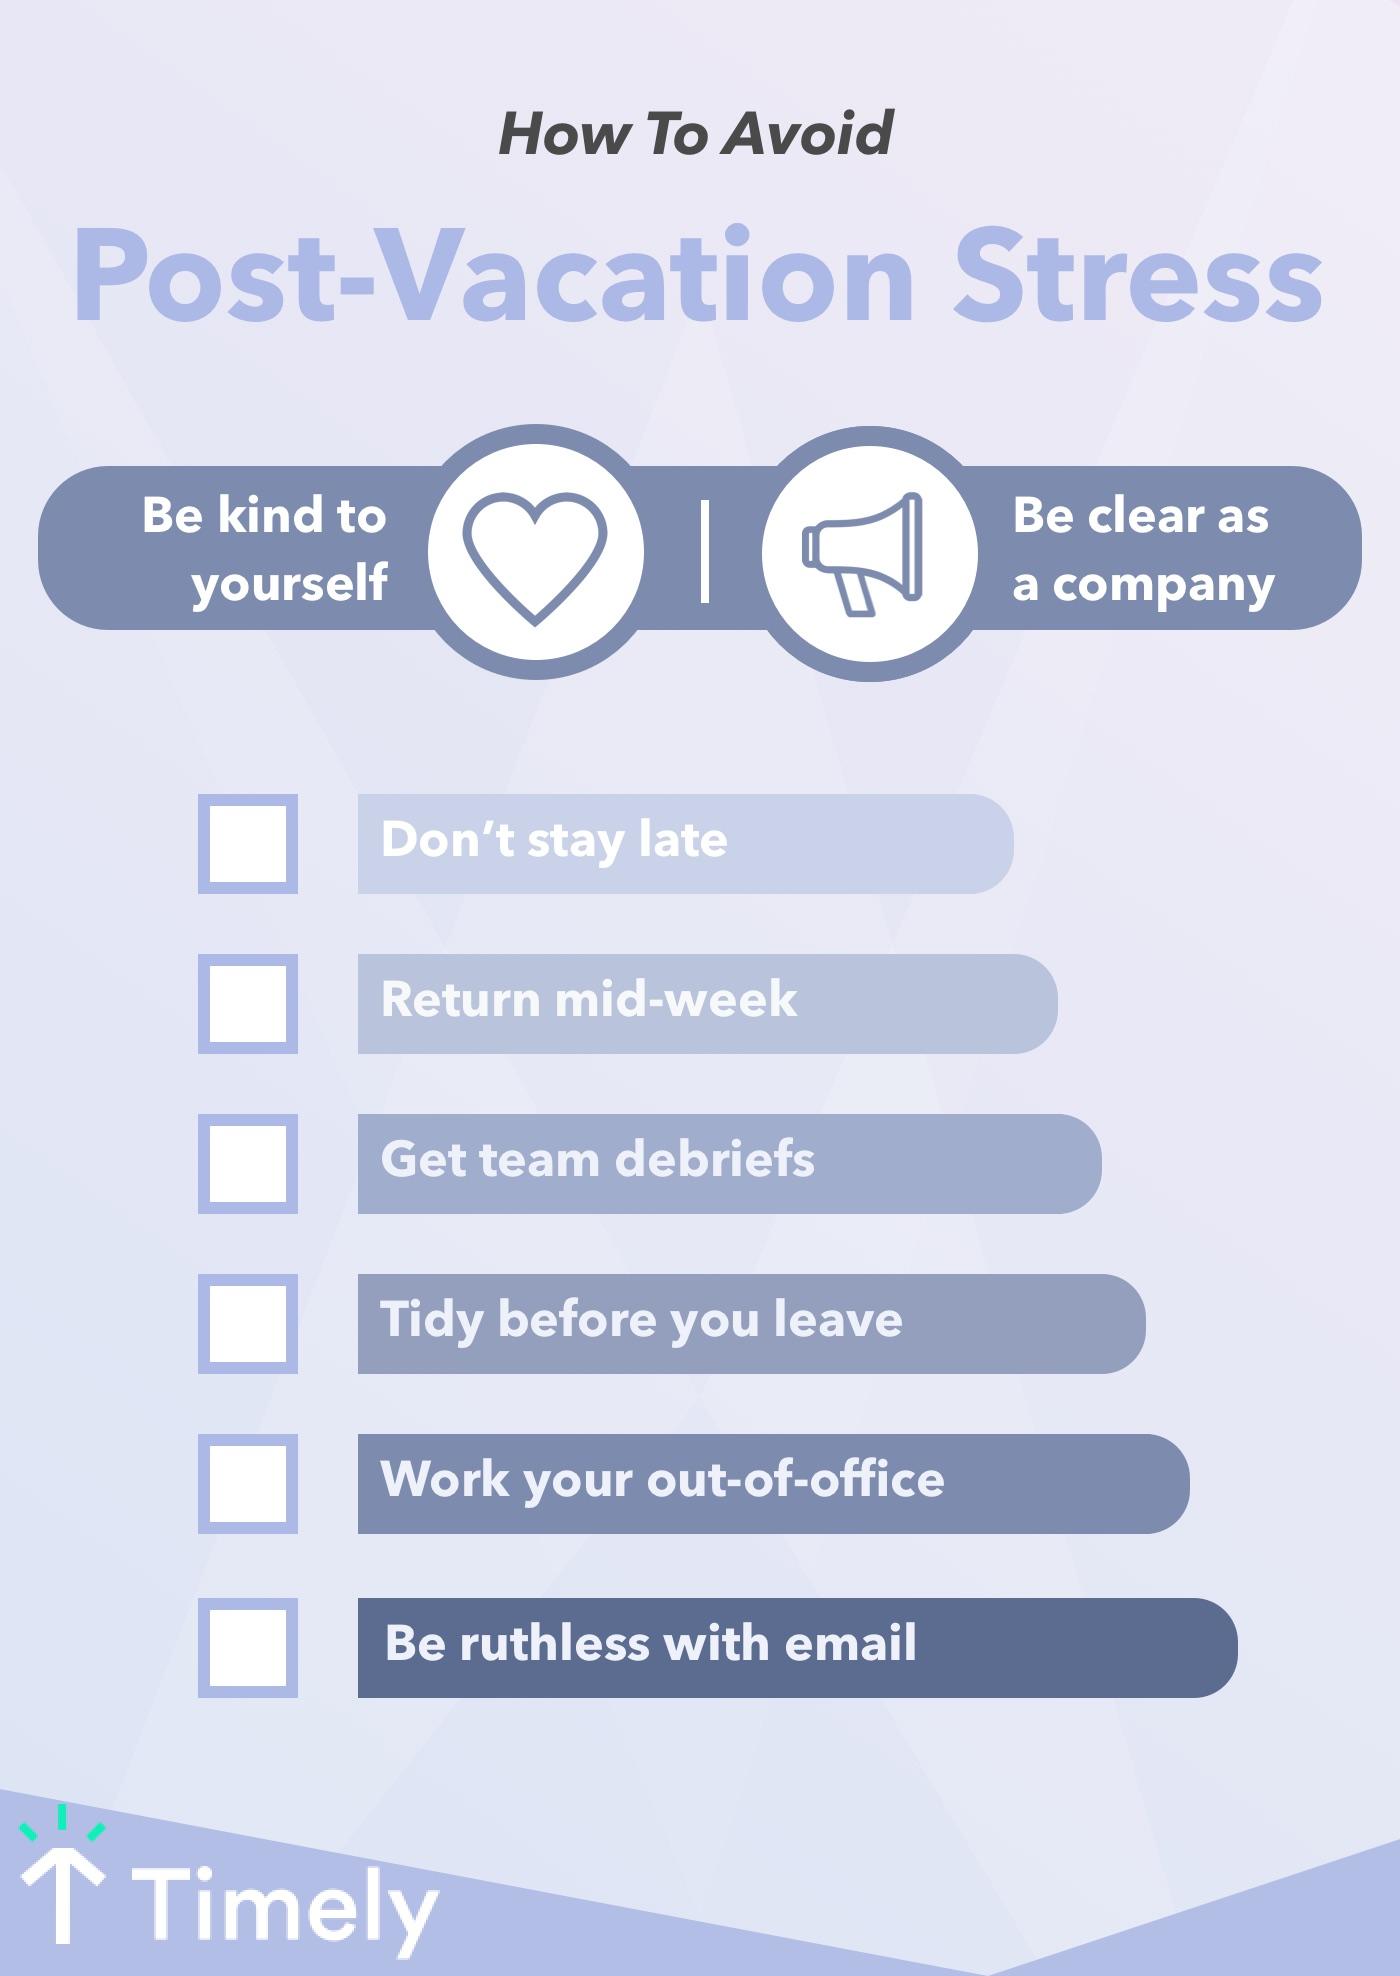 Post-vacation-stress-checklist@2x